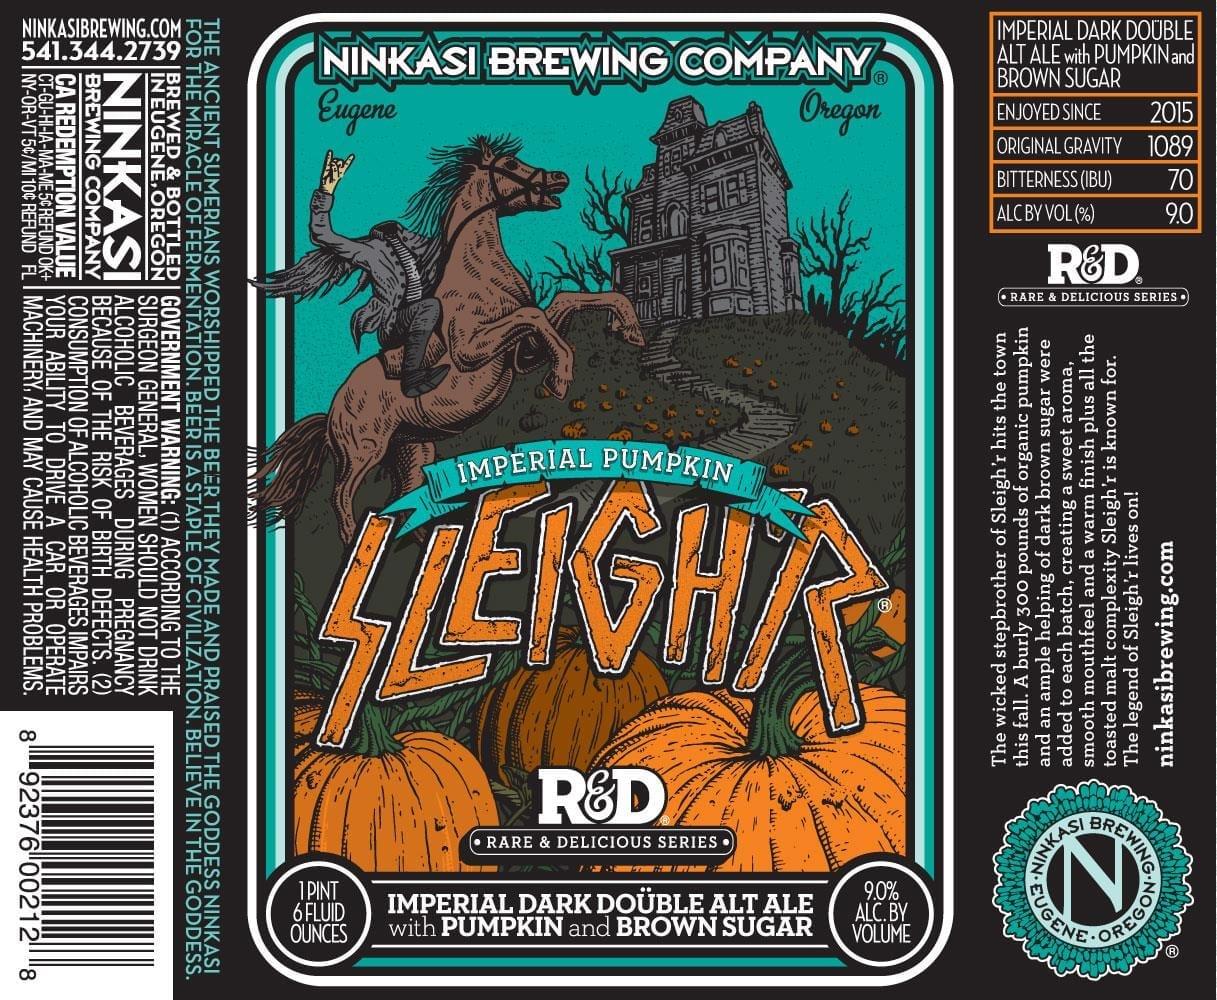 Ninkasi Brewing Company Imperial Pumpkin Sleigh'r